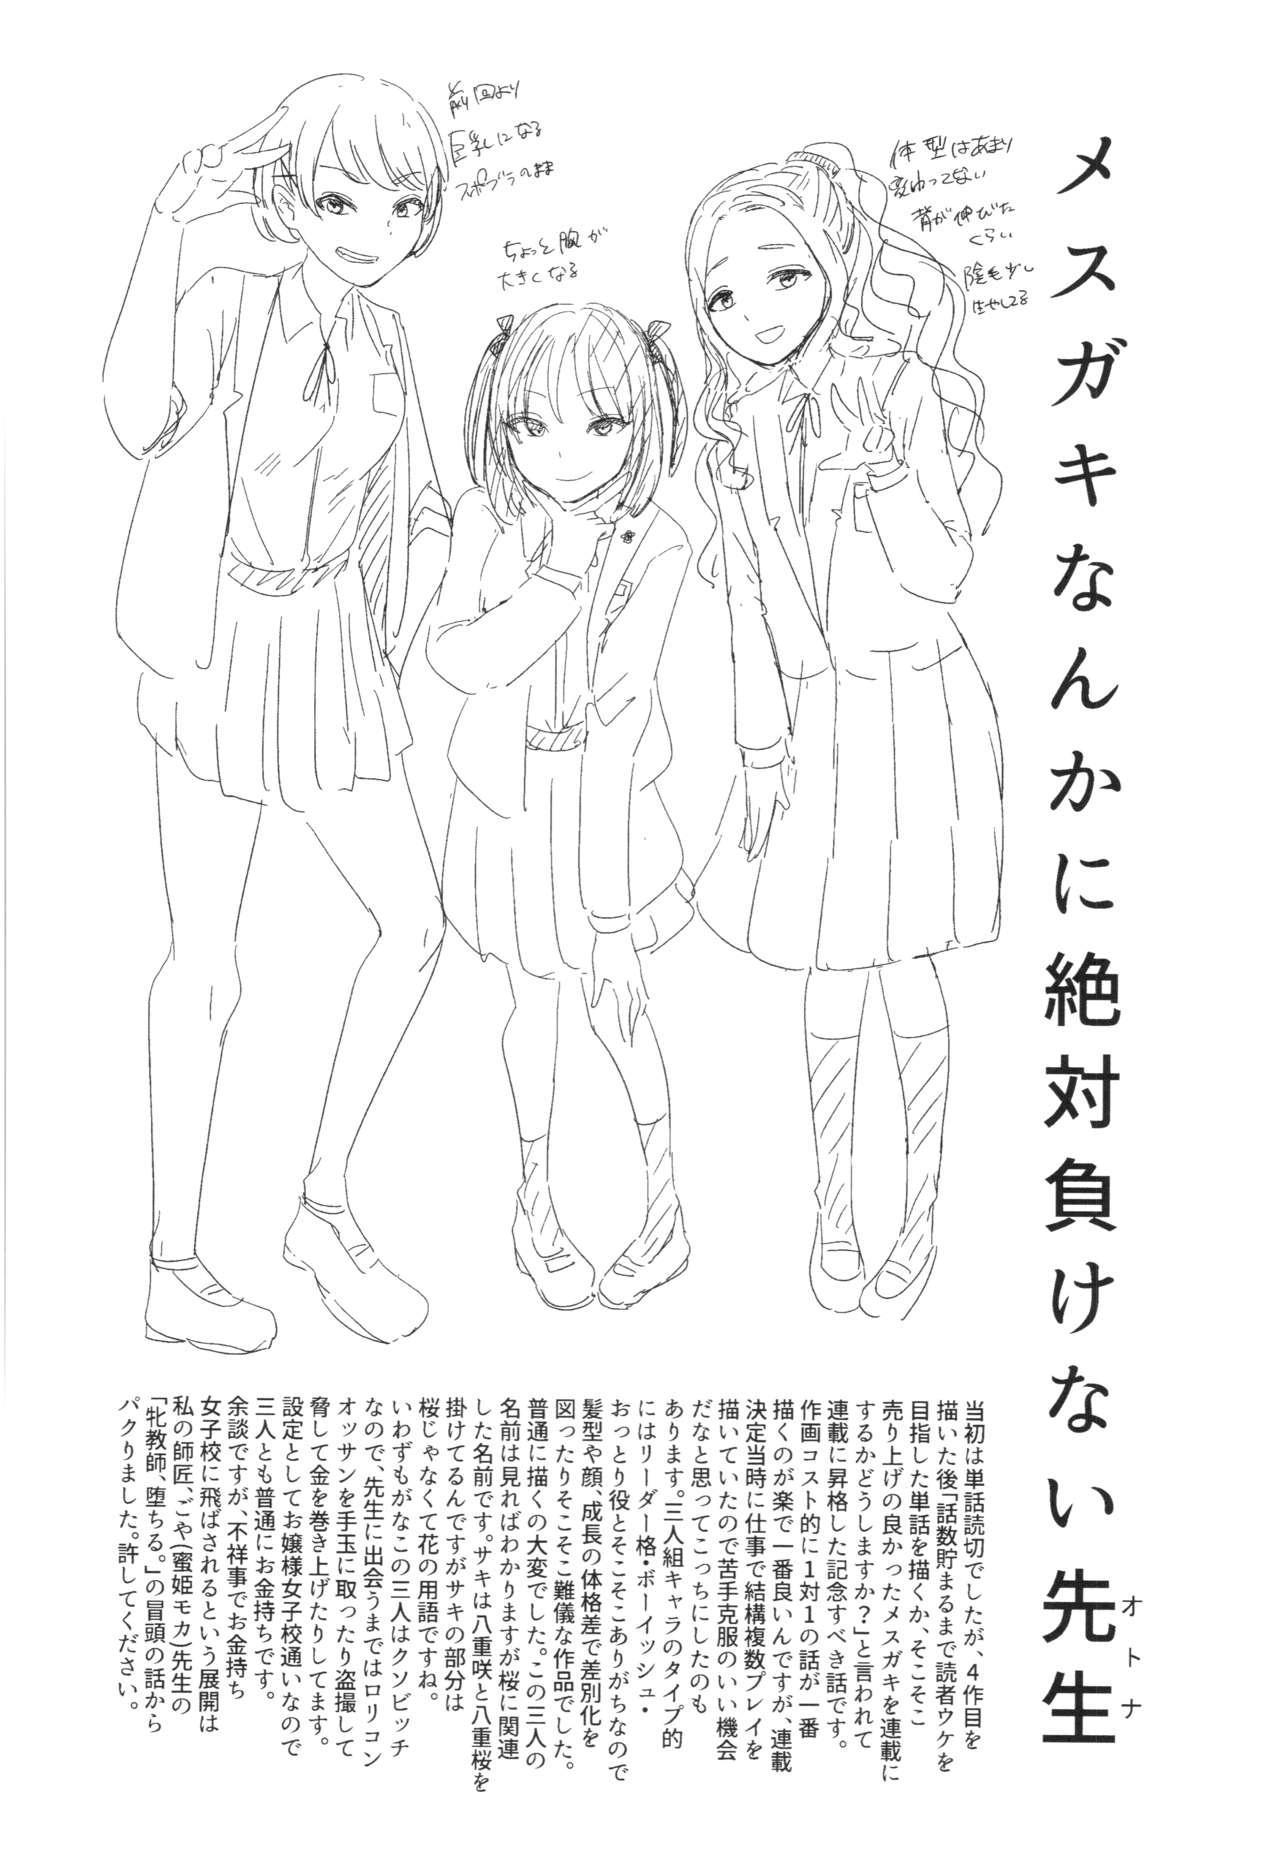 Sannenkan no Aoi Haru 128